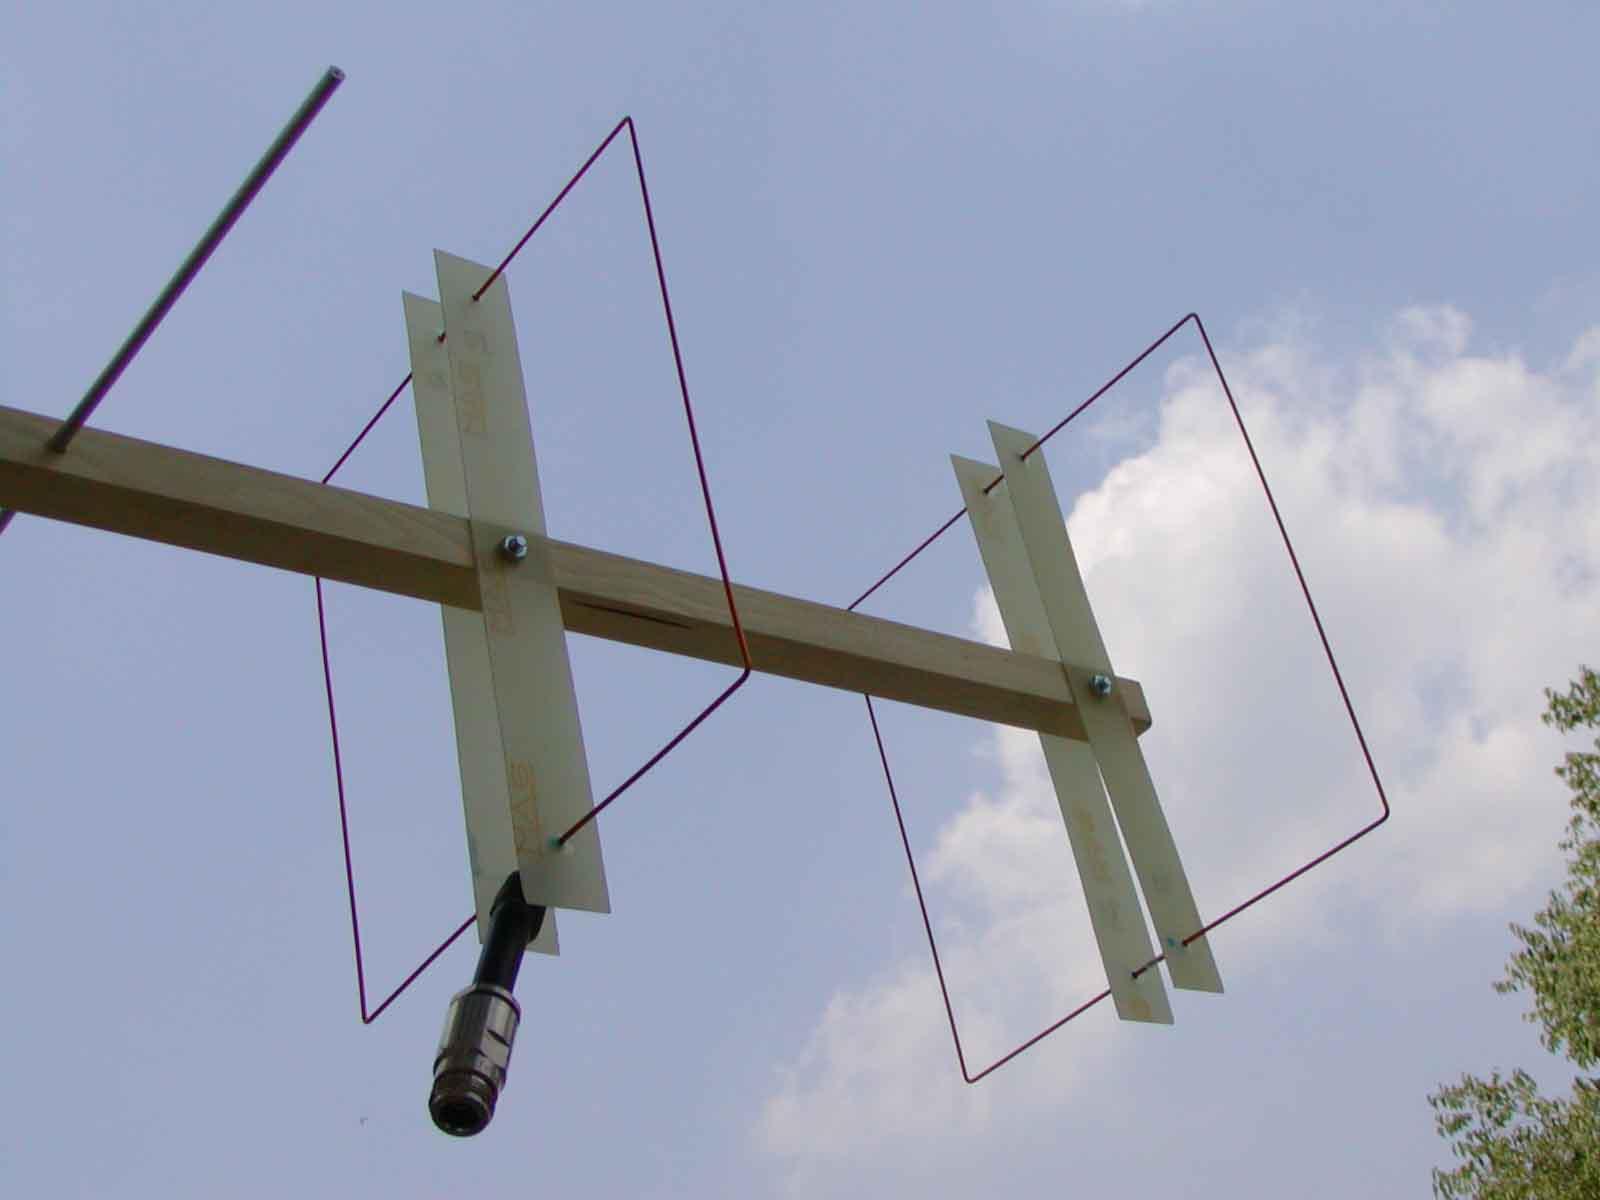 Ik1hge 432mhz 8el Quagi Antenna